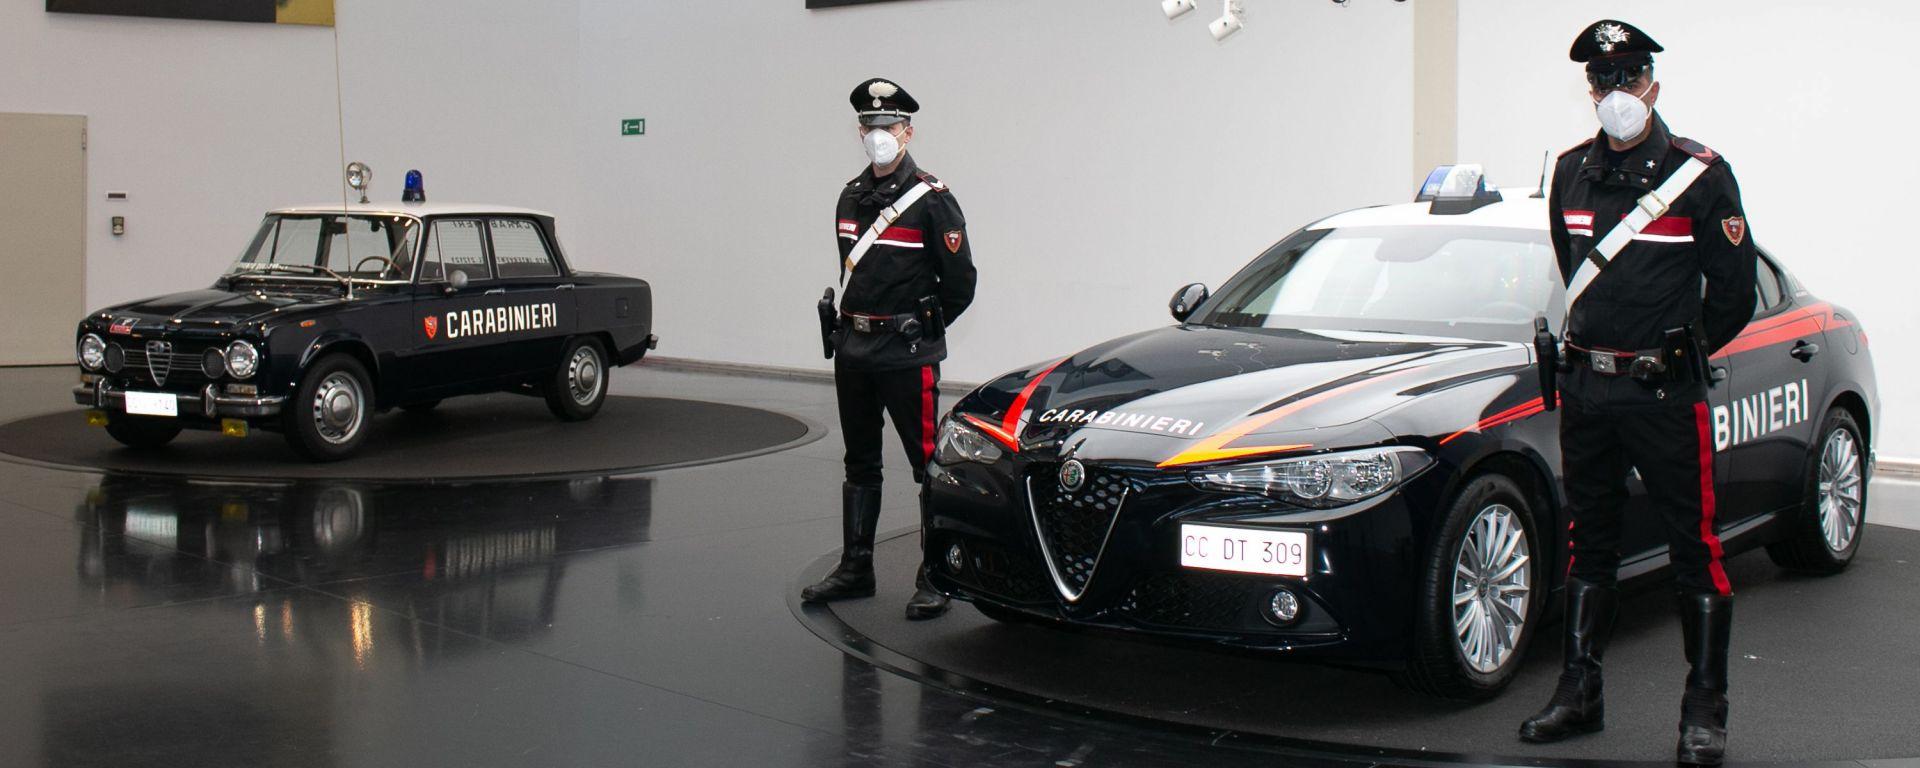 Alfa Romeo Giulia Radiomobile: la nuova Gazzella dei Carabinieri